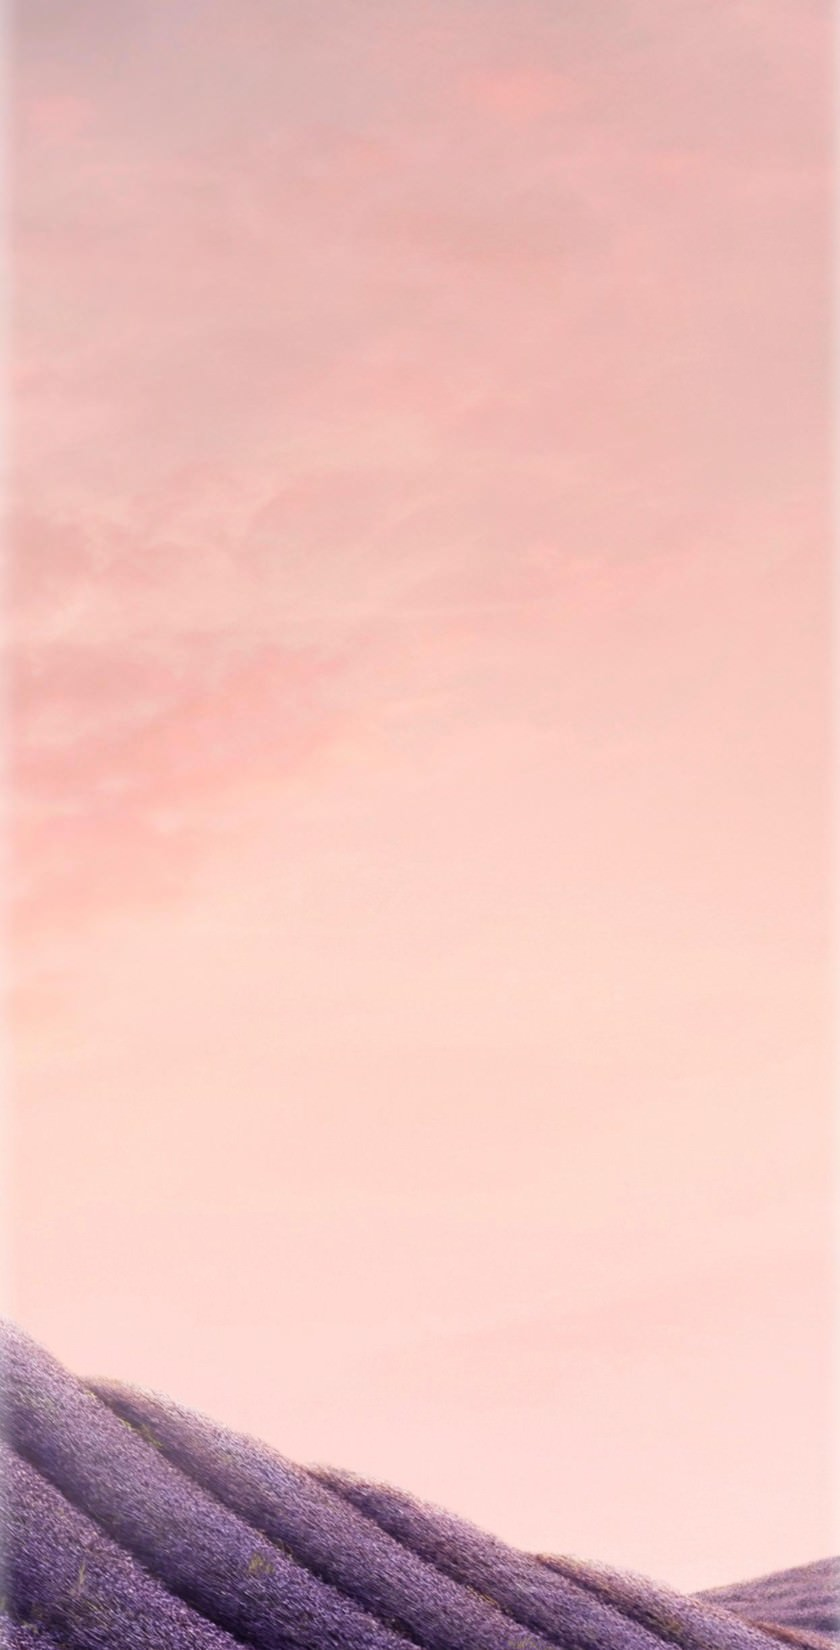 Galaxy S8 stock wallpaper